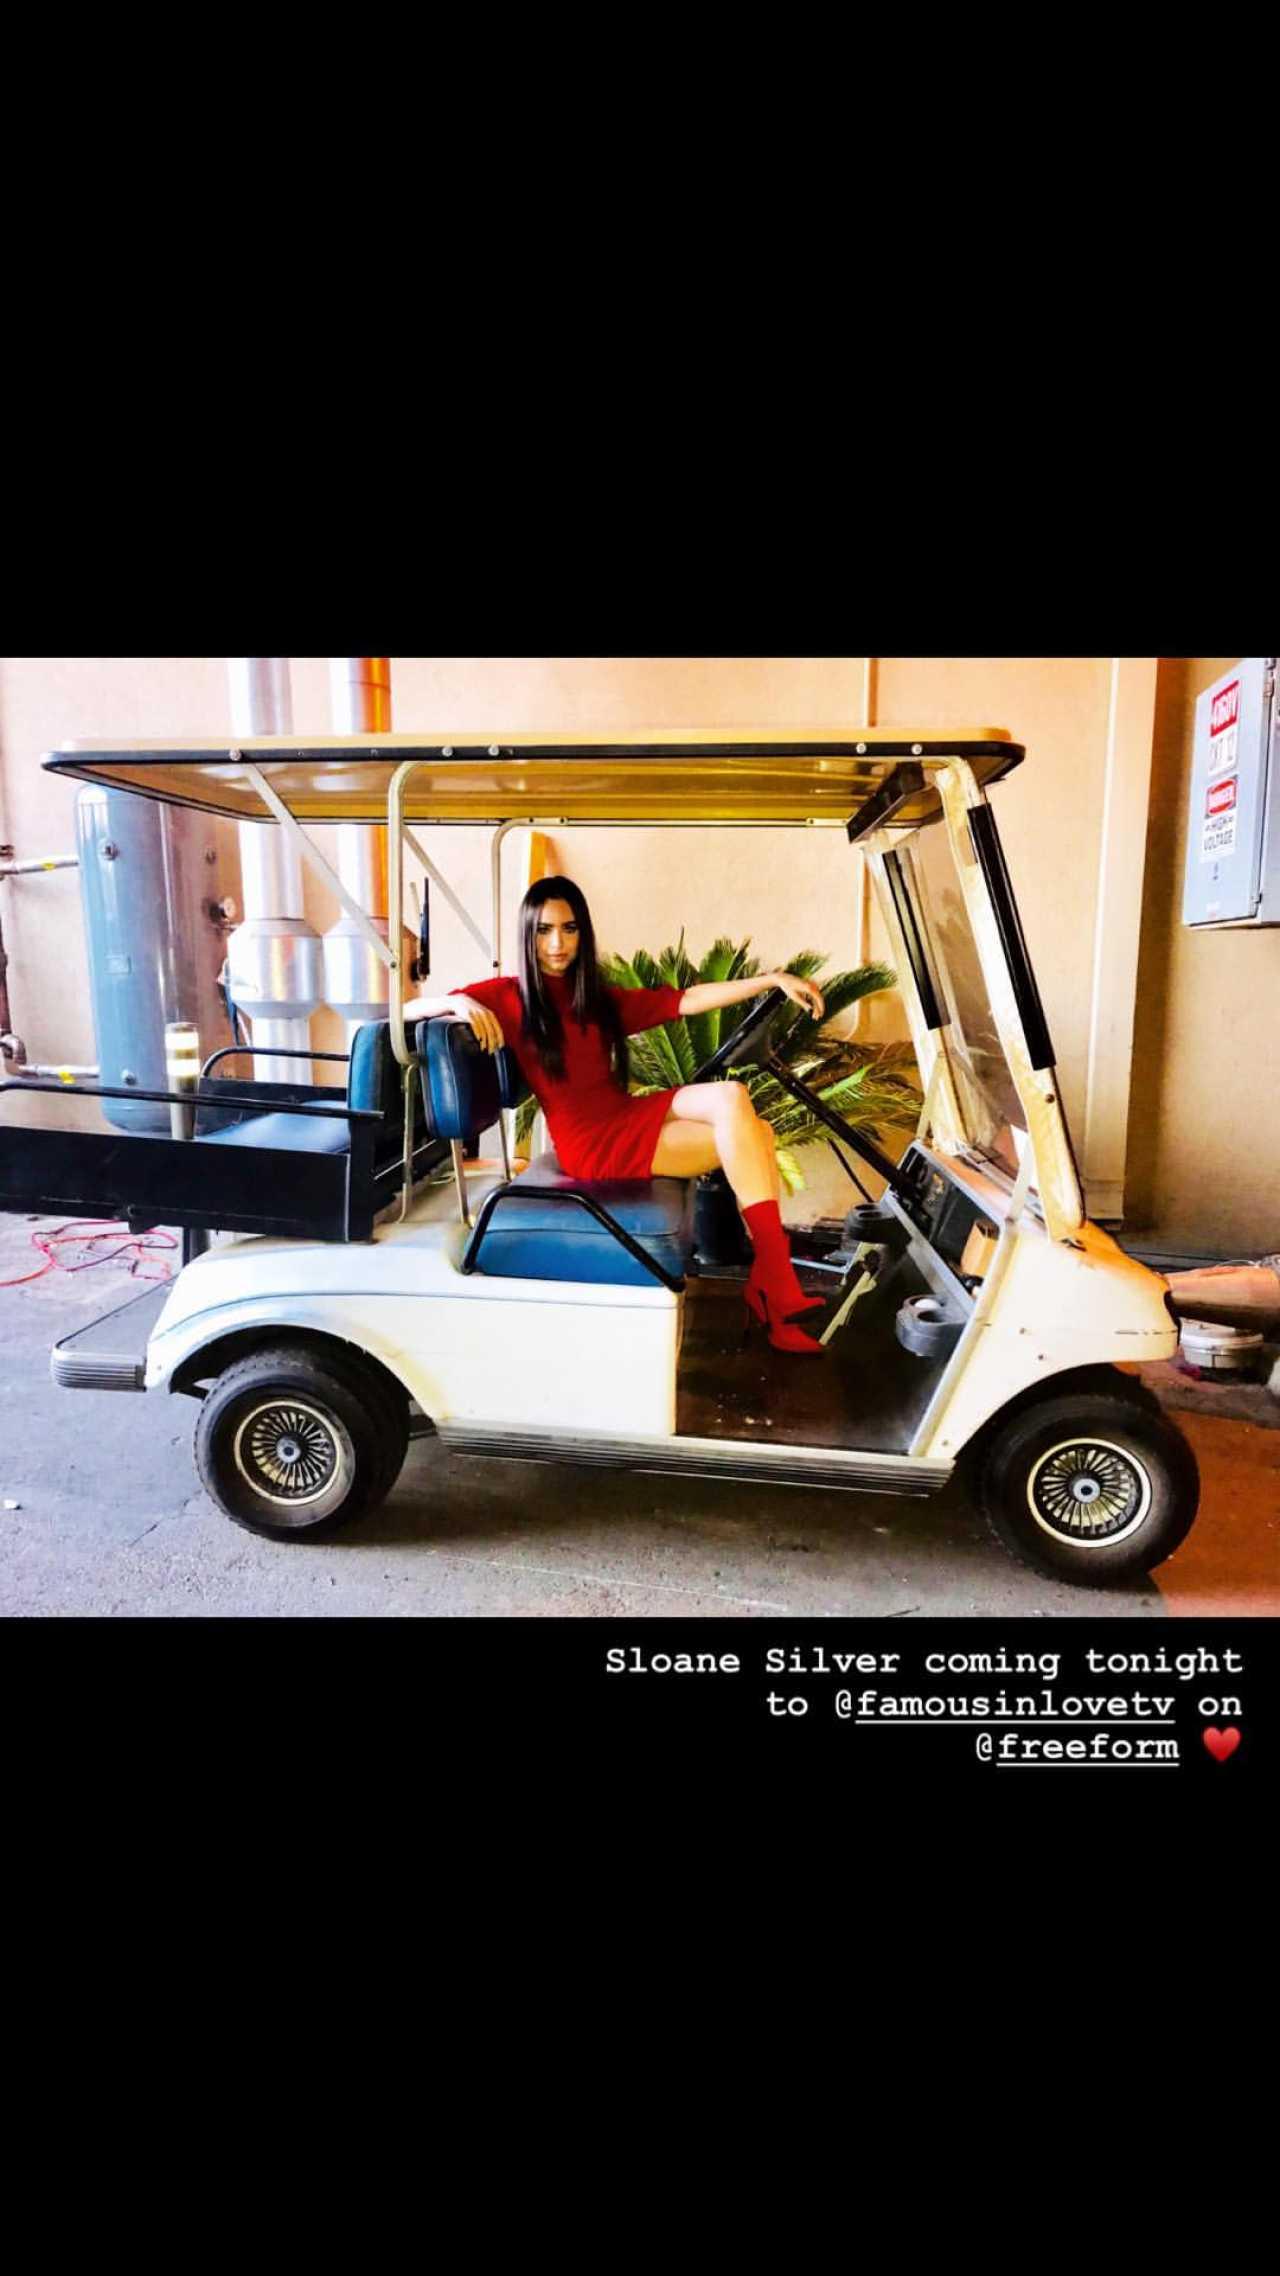 Sofia Carson 2020 : Sofia Carson – Instagram and social media pics-41